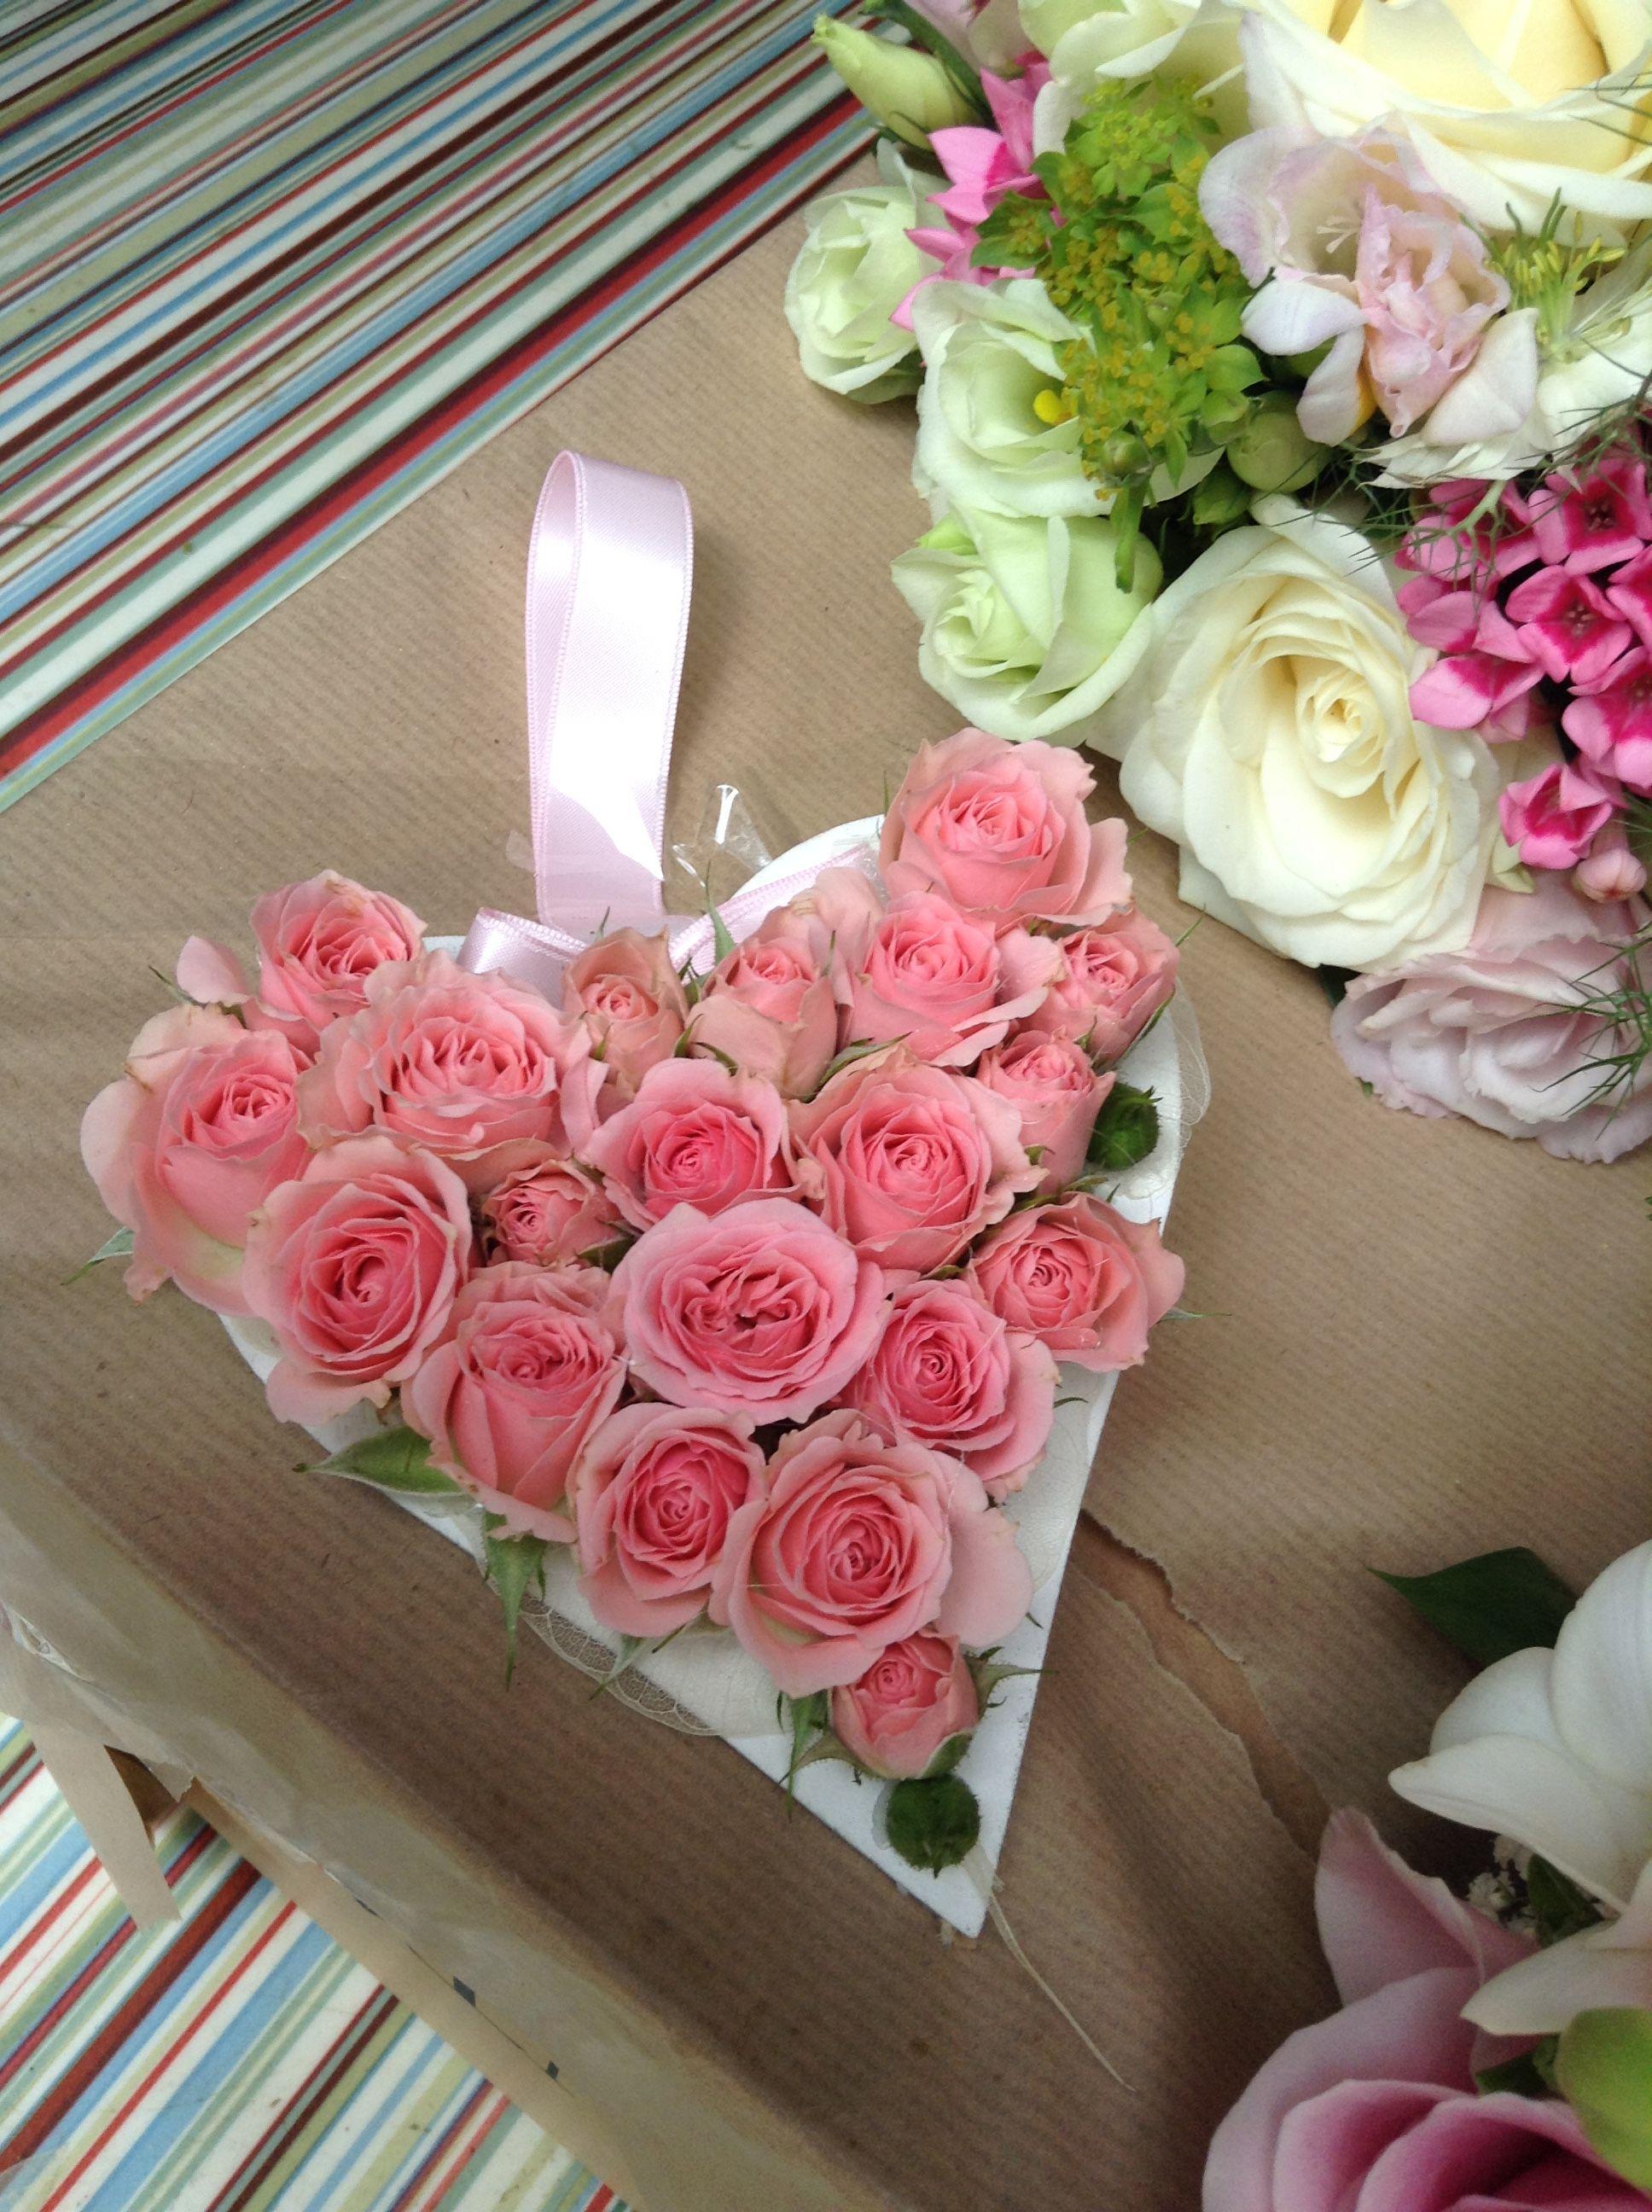 Pin On Www Haylingflorist Co Uk Wedding Flowers By Deborah Nash